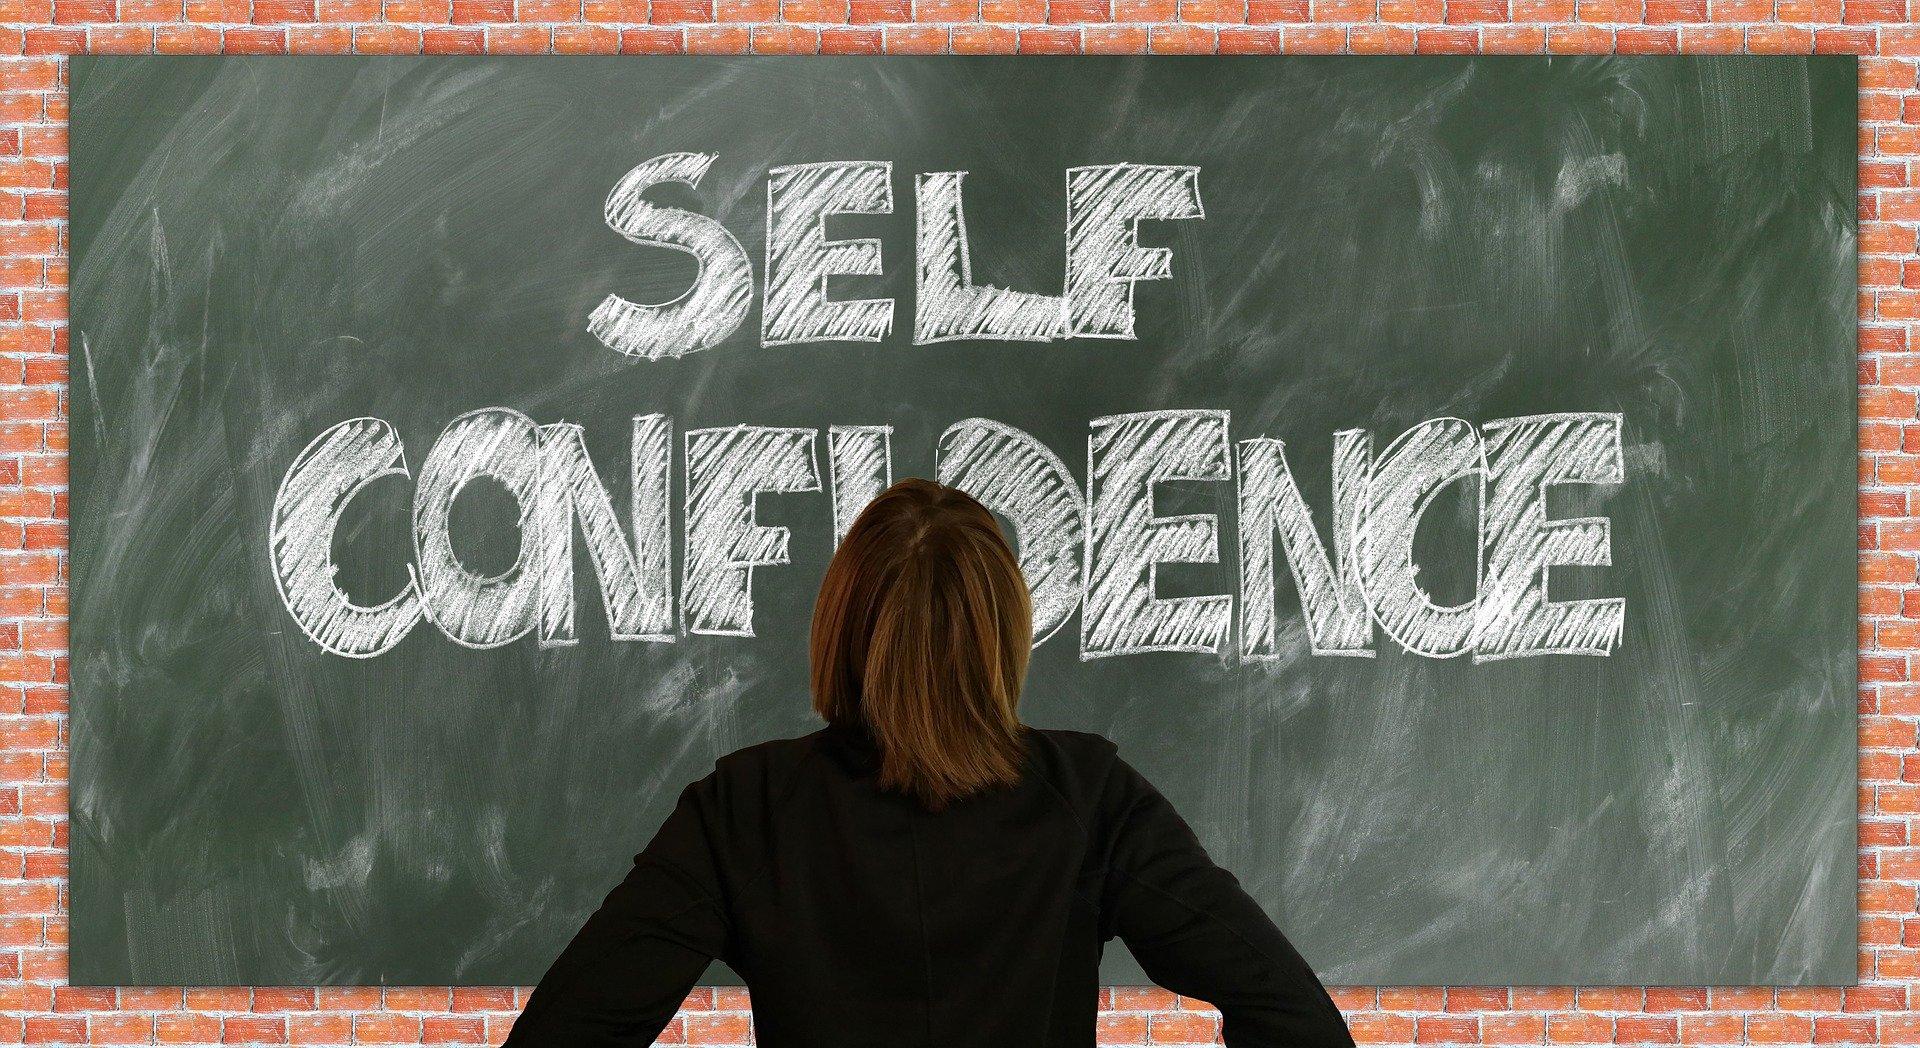 motivation, wish, choice, subconscious mind, unconscious mind,comfort zone, thoughts, emotions, behaviour, change, doubt, self-efficacy, trust, courage, confidence, action